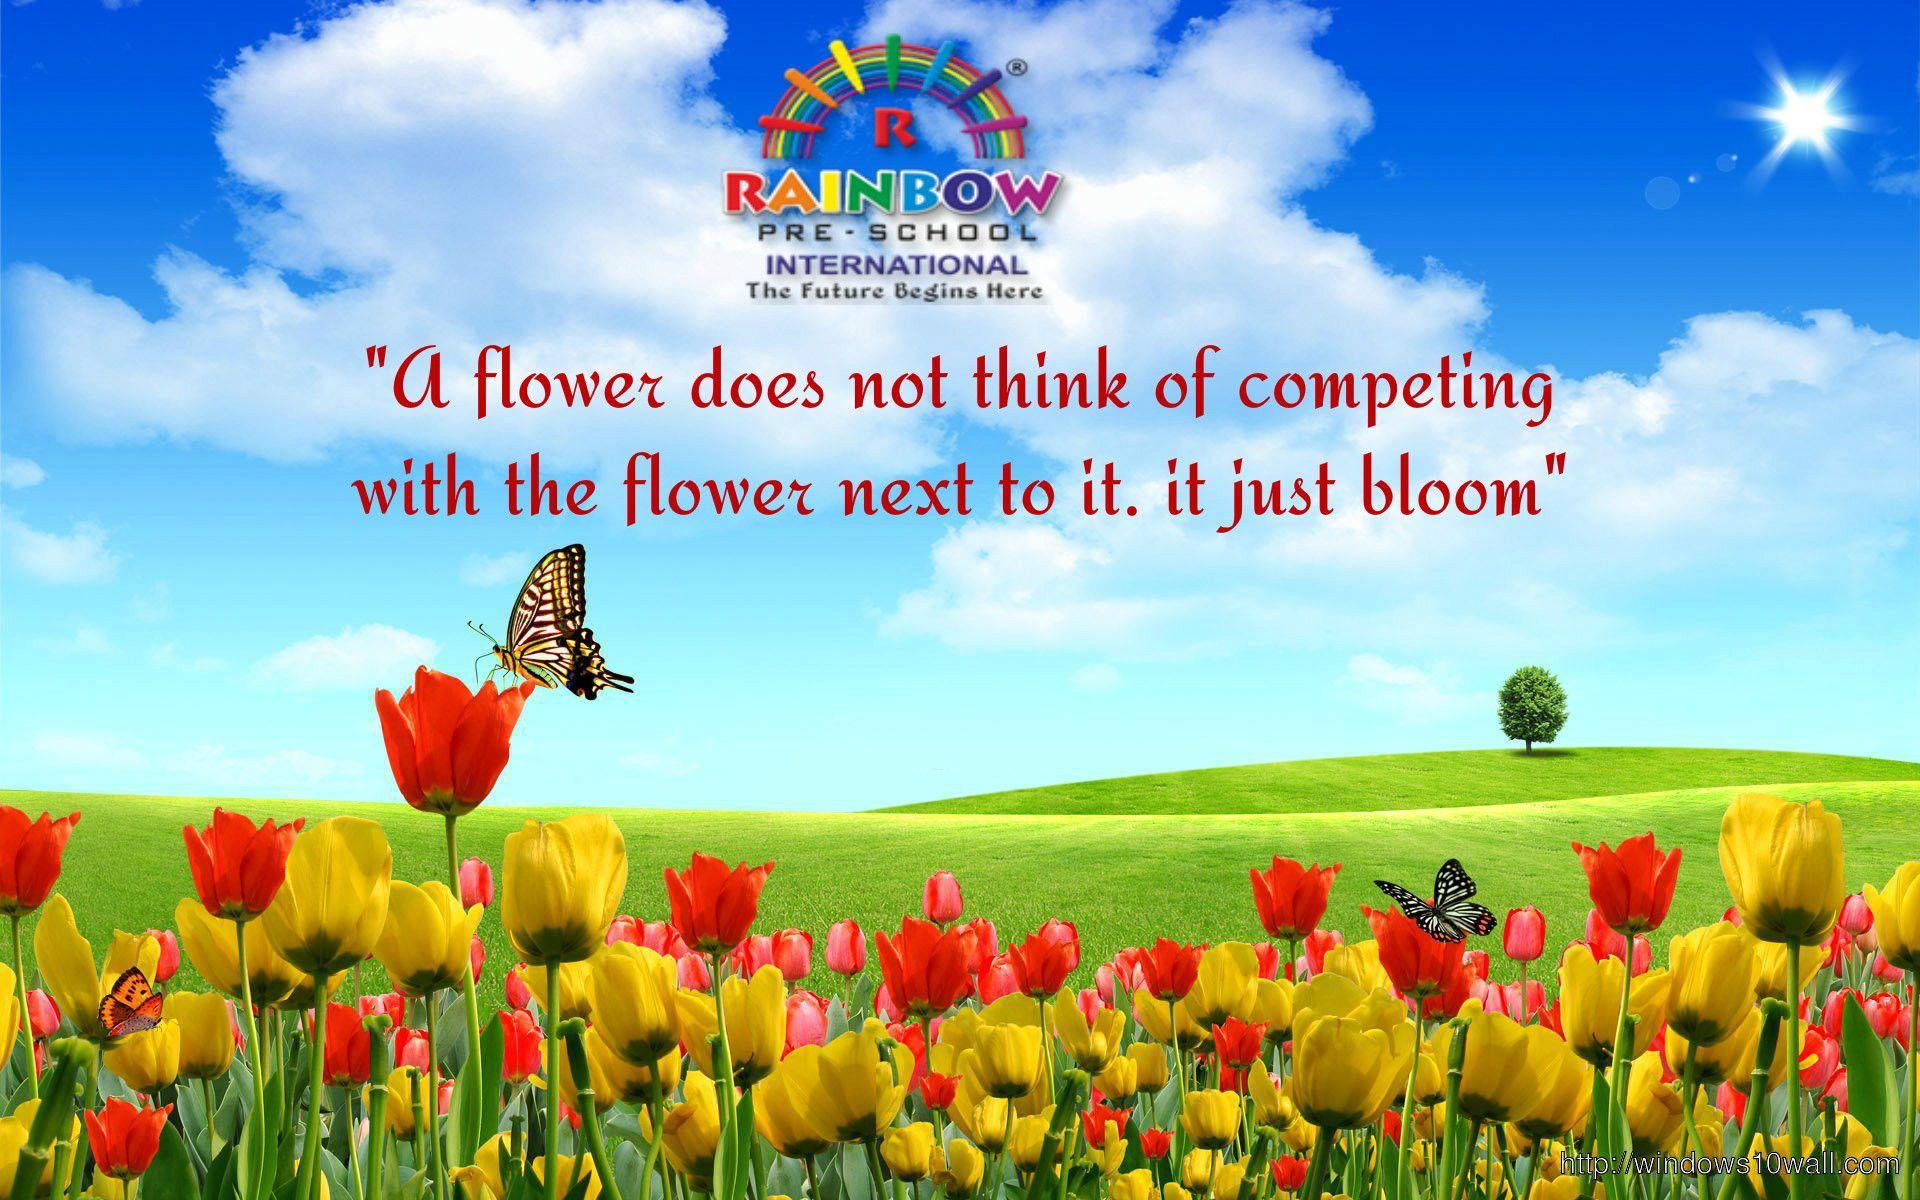 pinrainbow preschool international ltd on goodmorning | quotes